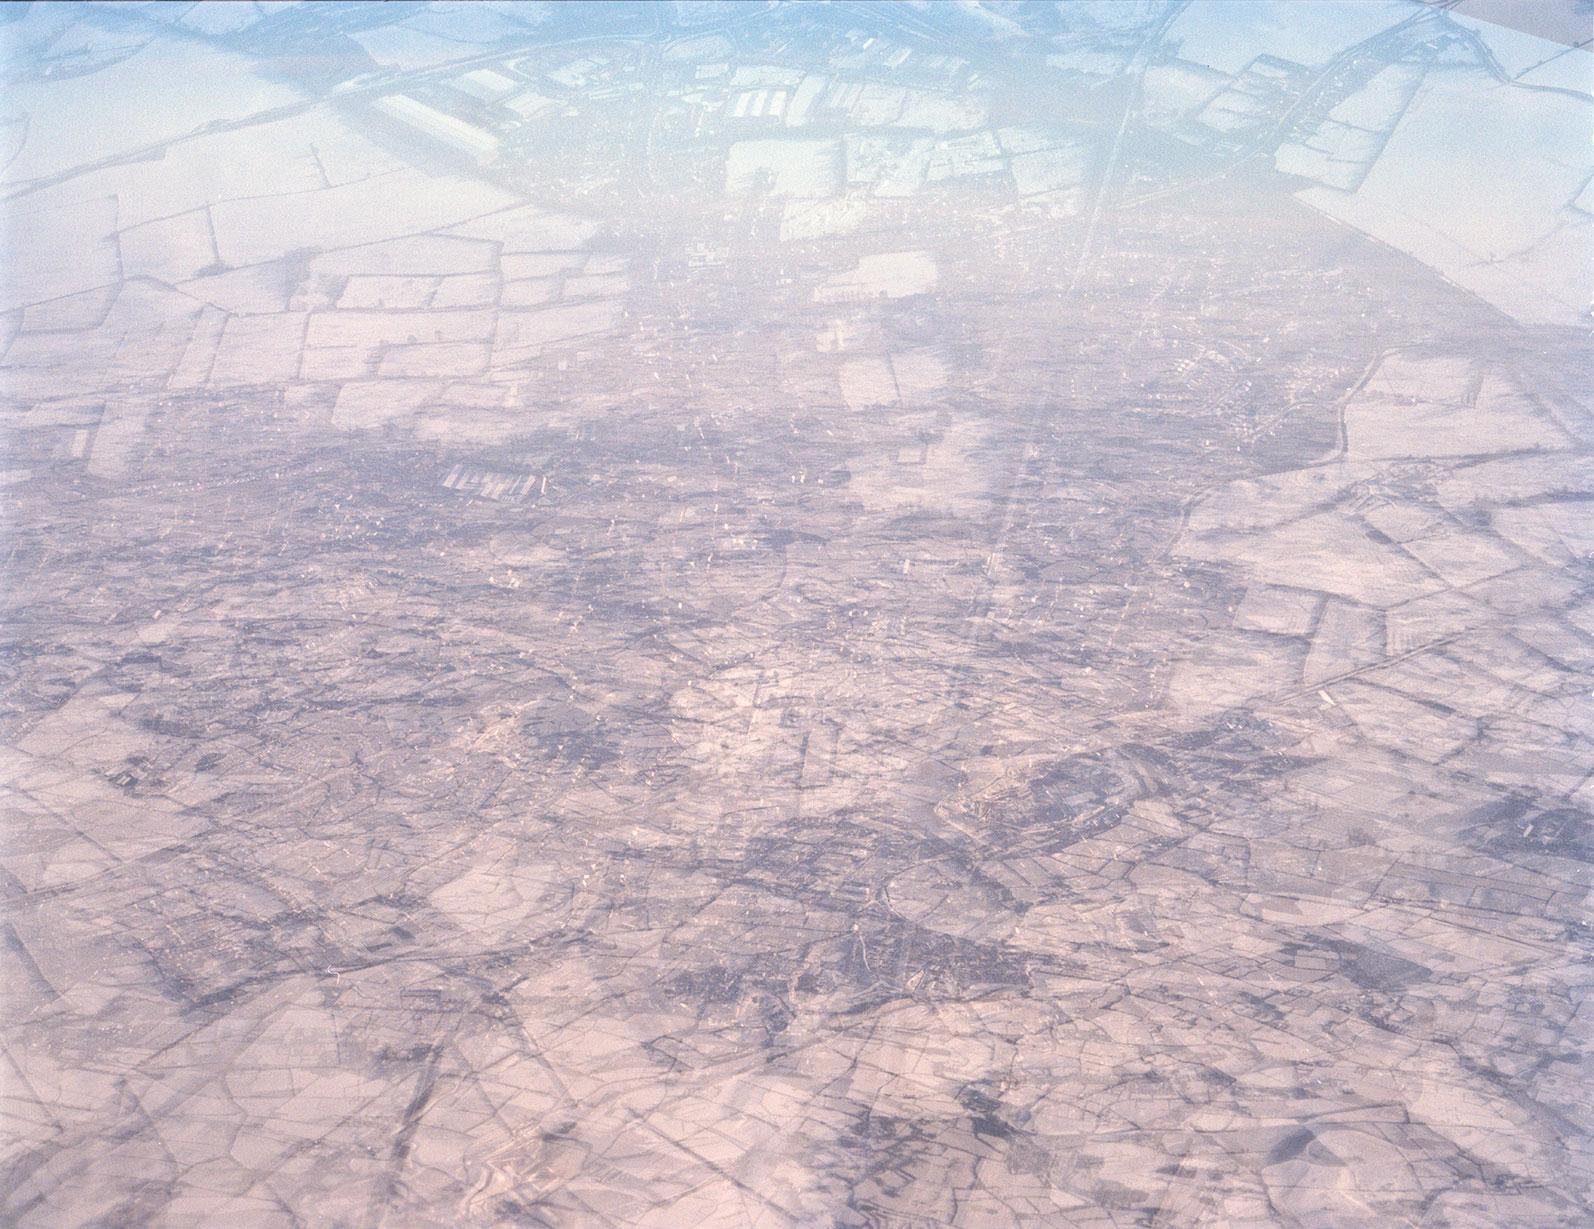 a snowy flight